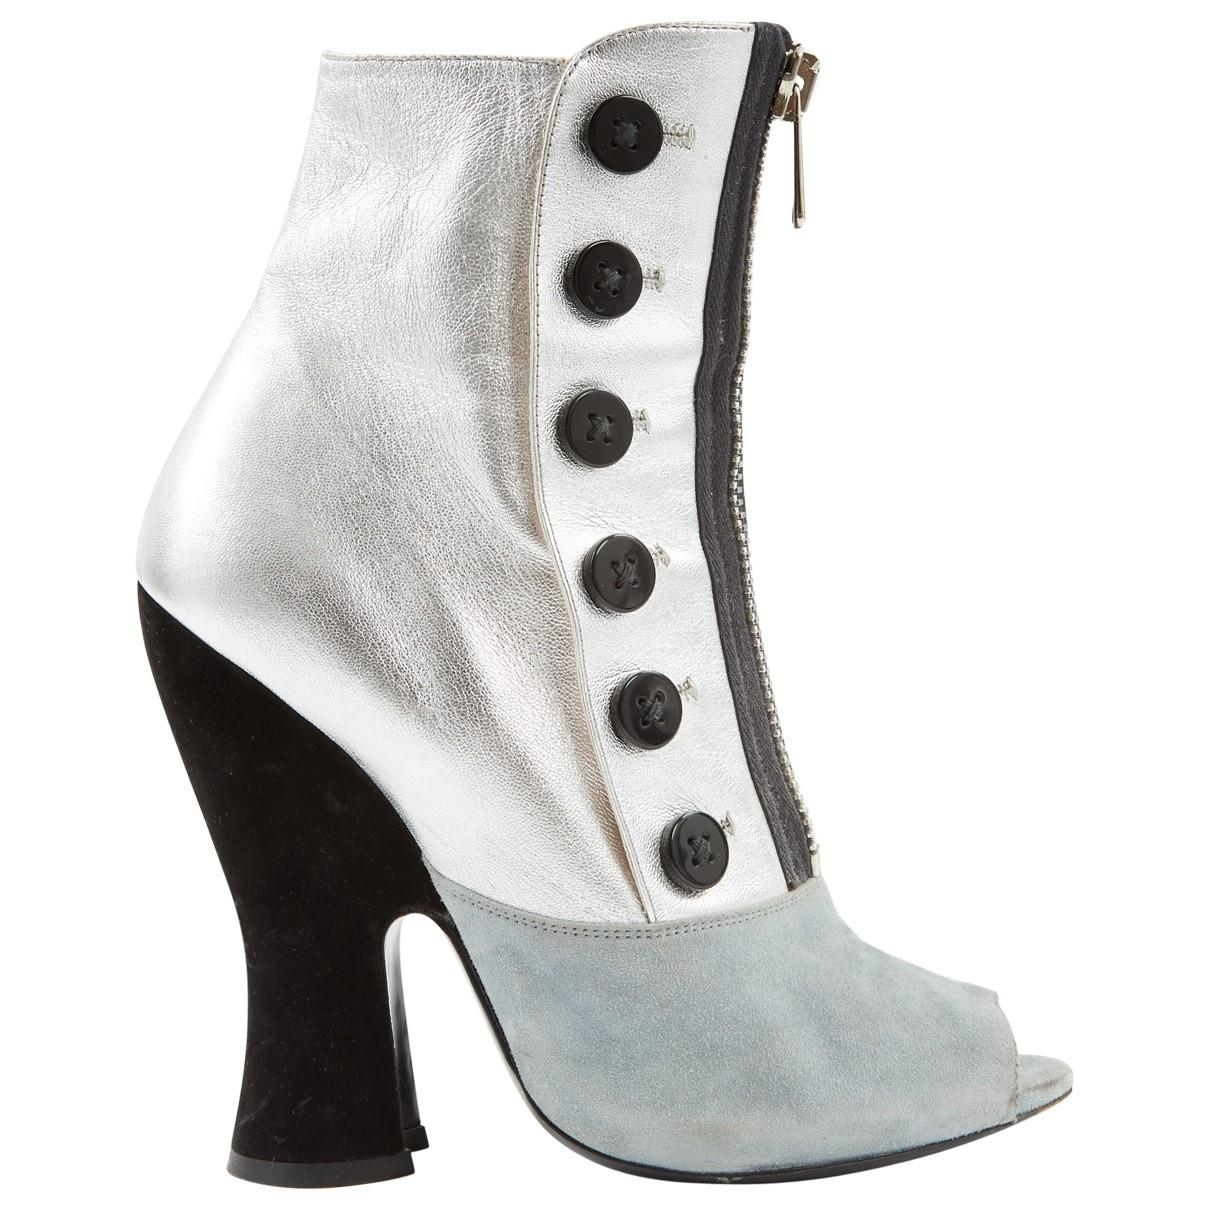 540cc441e6f4 Lyst - Miu Miu Silver Leather Ankle Boots in Metallic